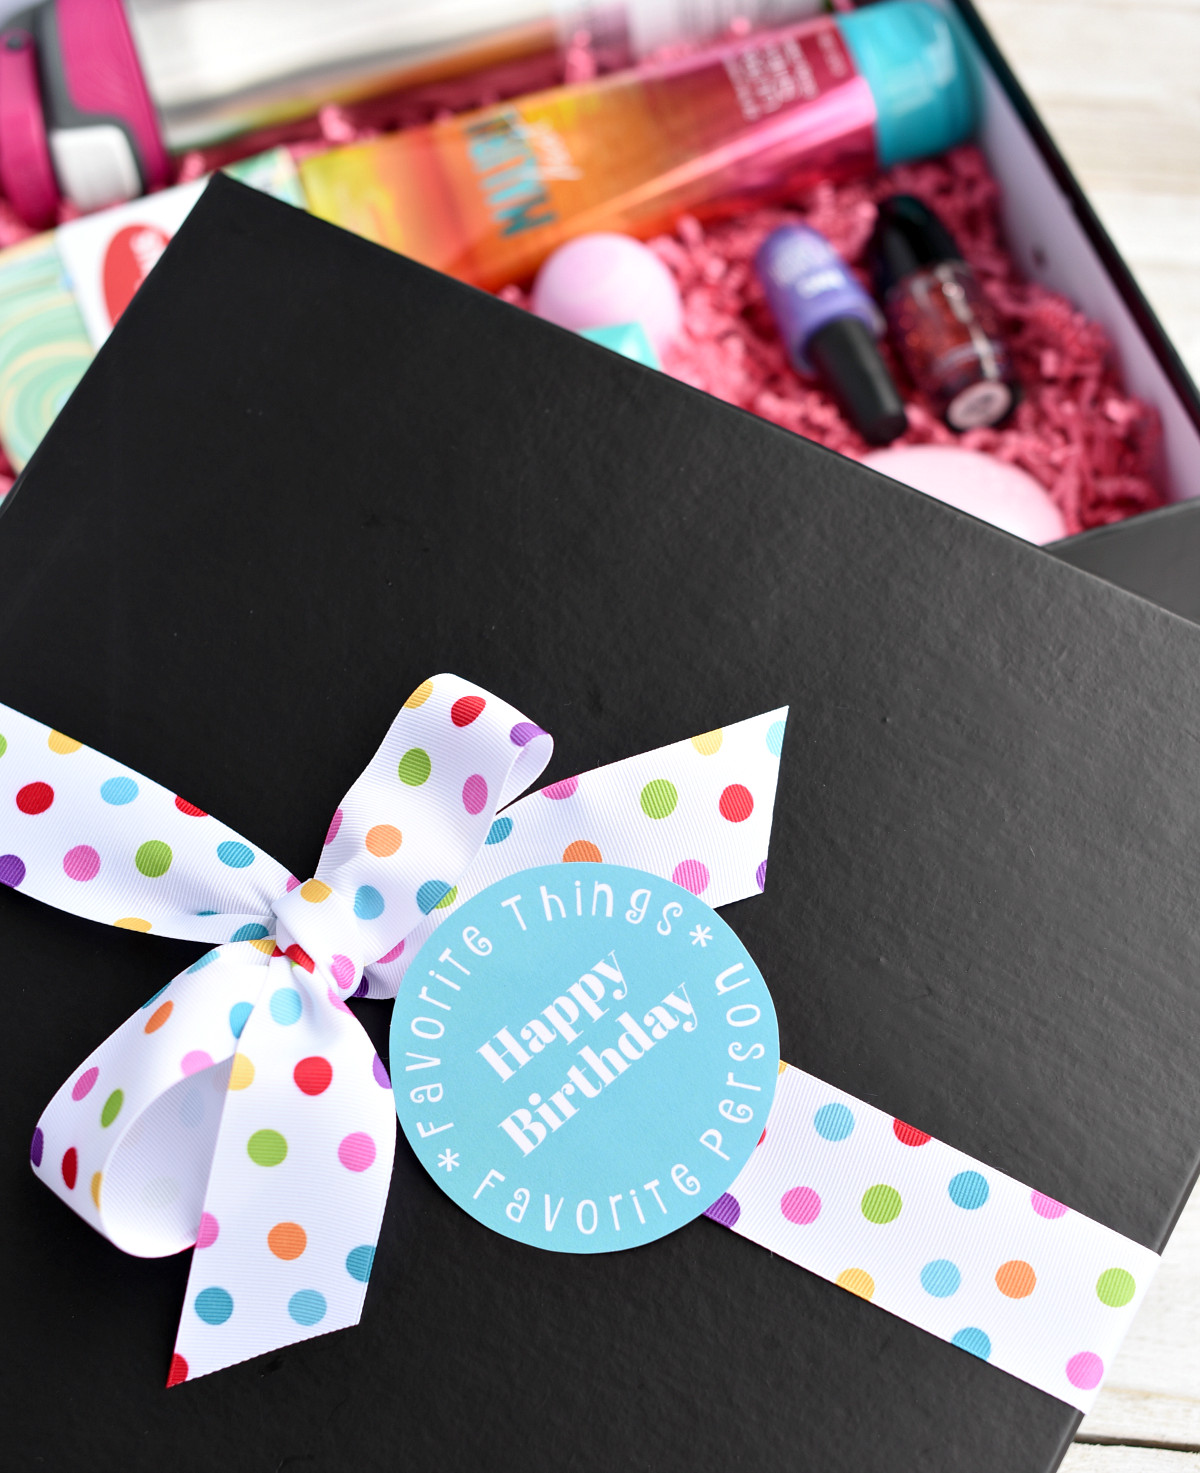 Best Friends Birthday Gifts  My Favorite Things Birthday Gifts for Your Best Friend